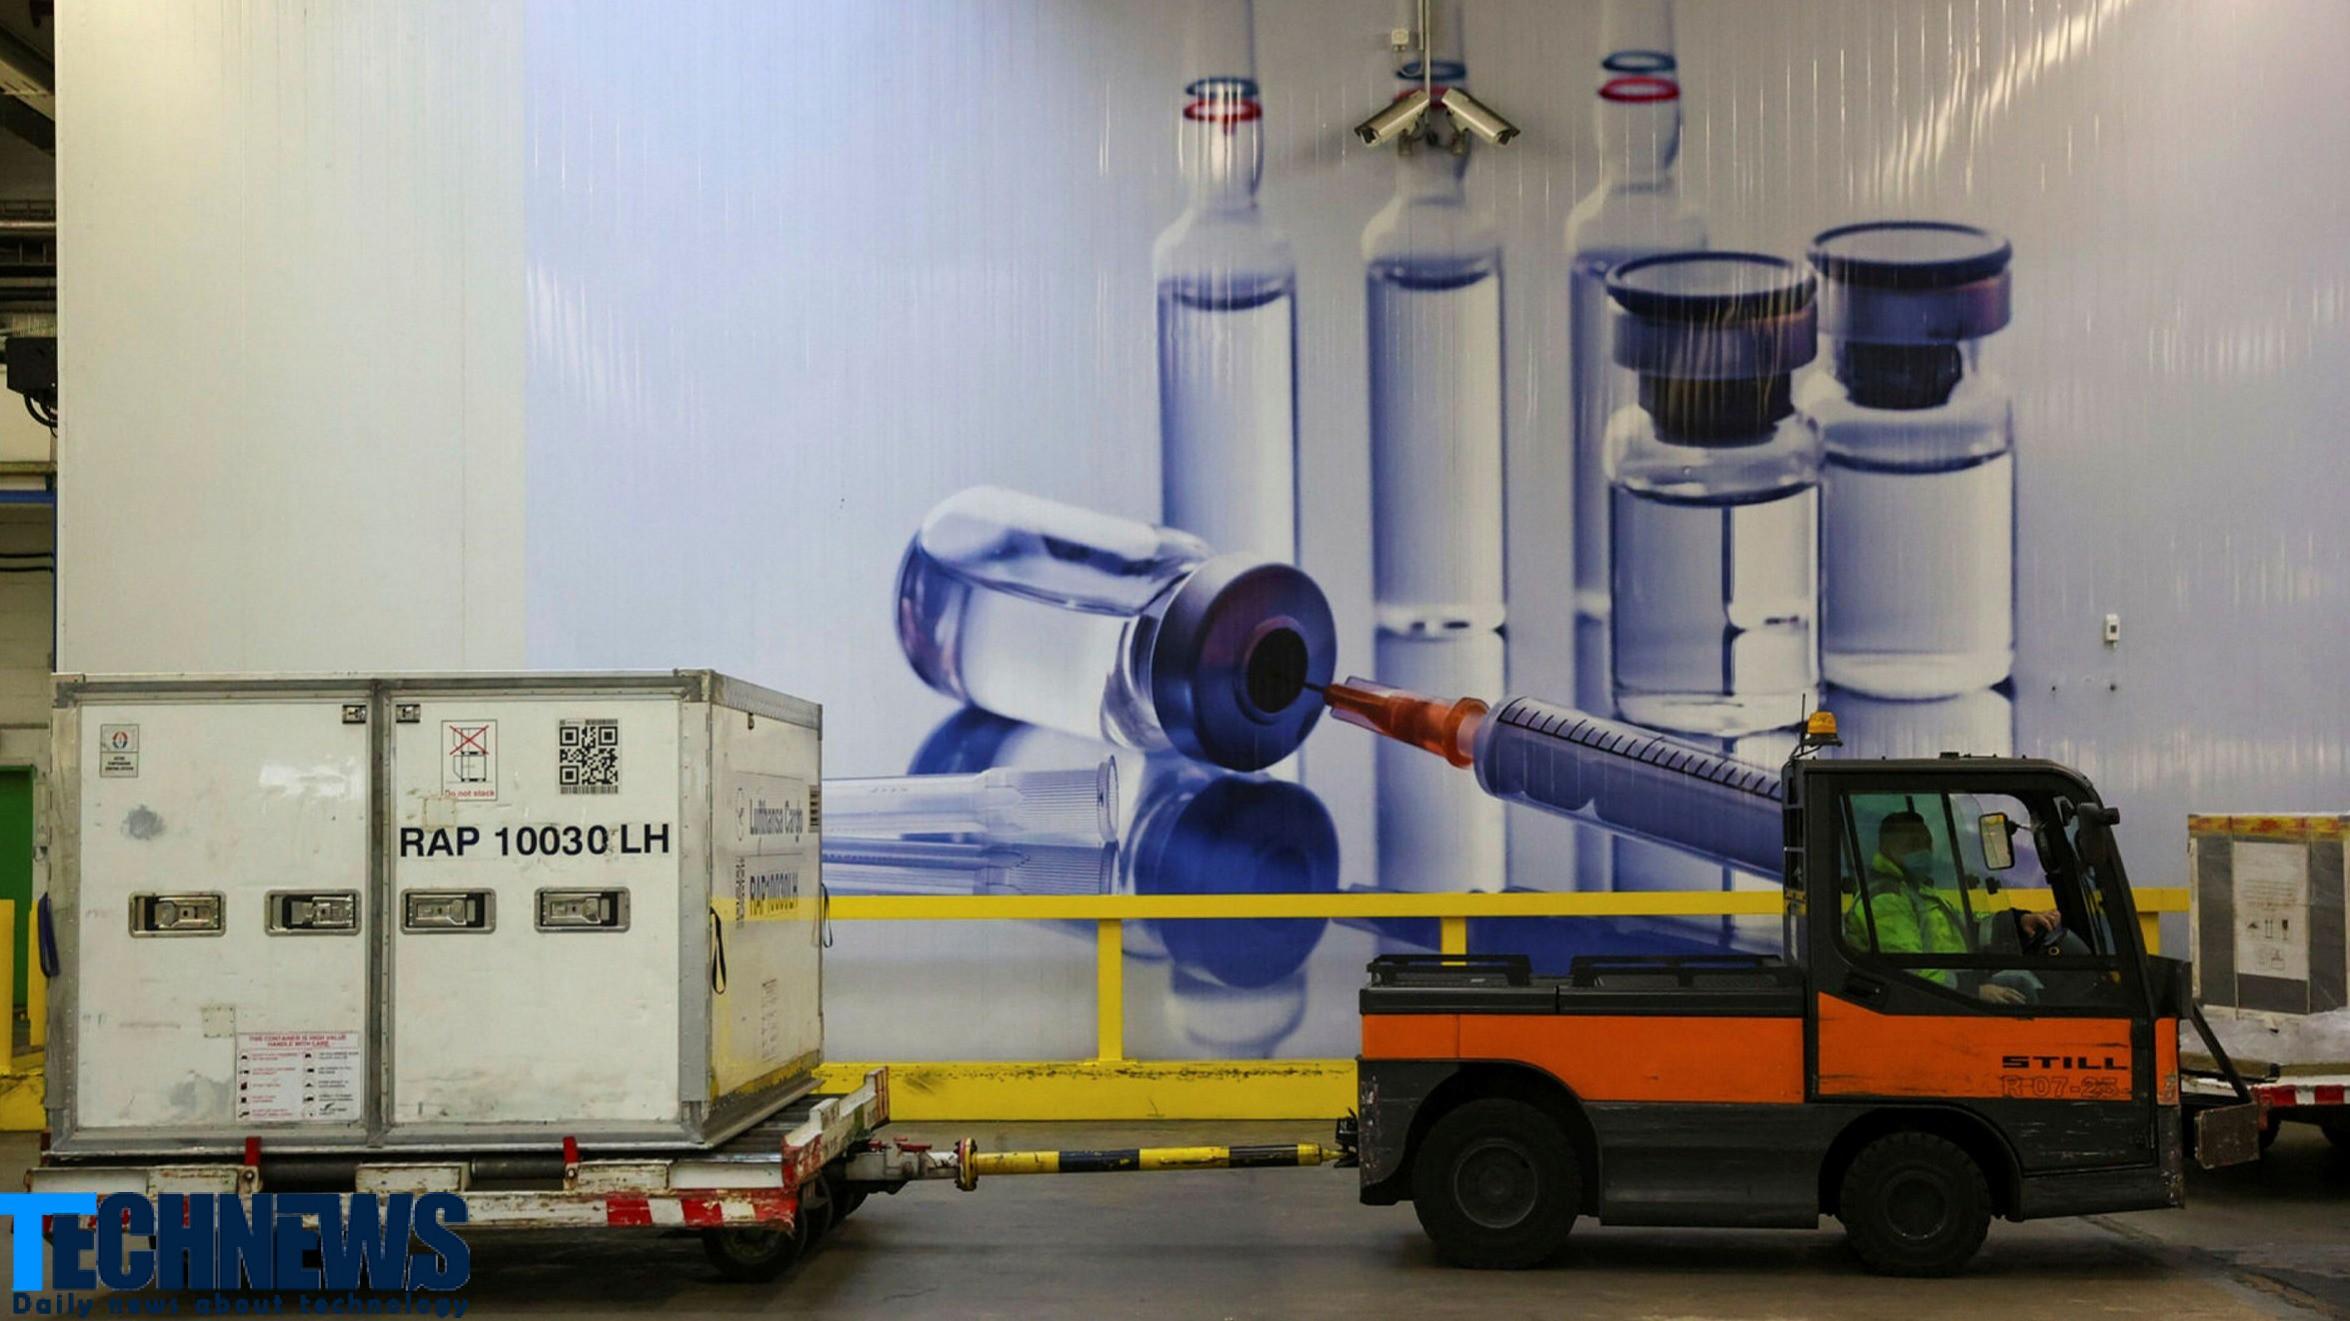 Photo of کمپانی IBM اعلام کرده احتمال هک گسترده علیه زنجیره تامین واکسن کرونا وجود دارد